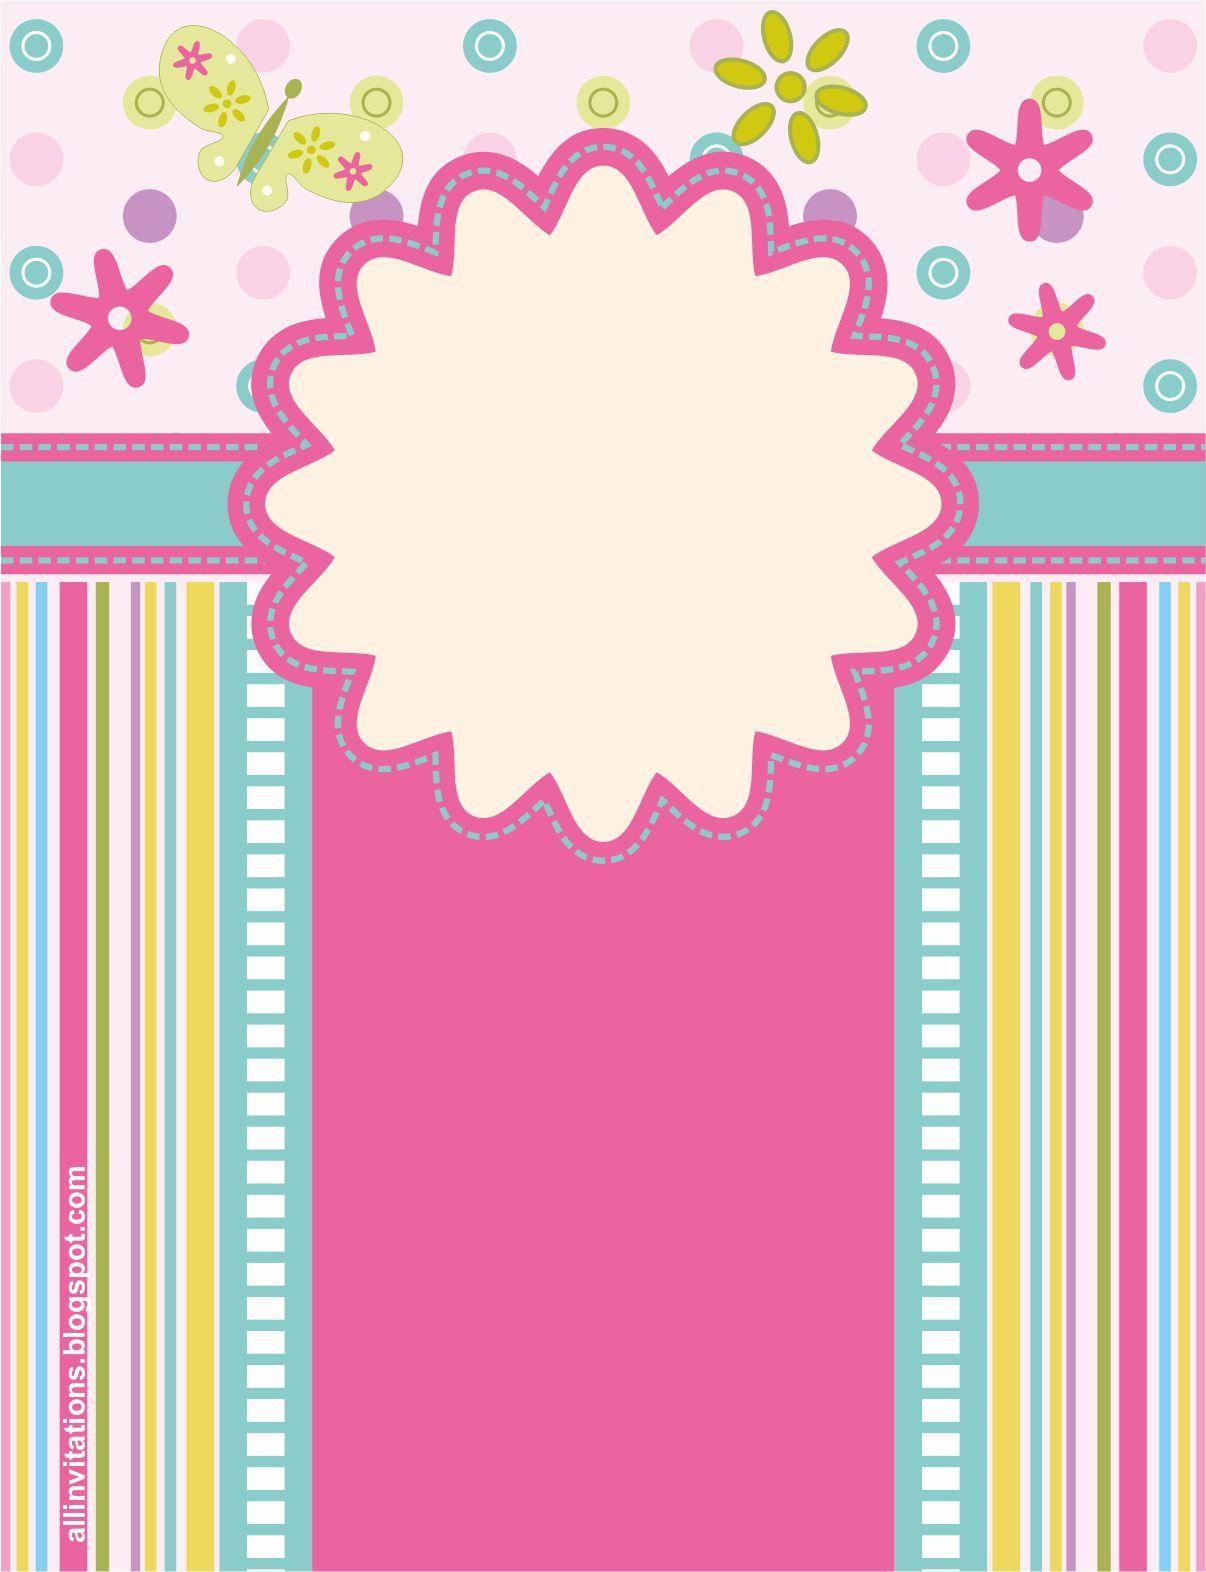 Fondos y marcos para baby shower - Imagui | imagenes | Pinterest ...